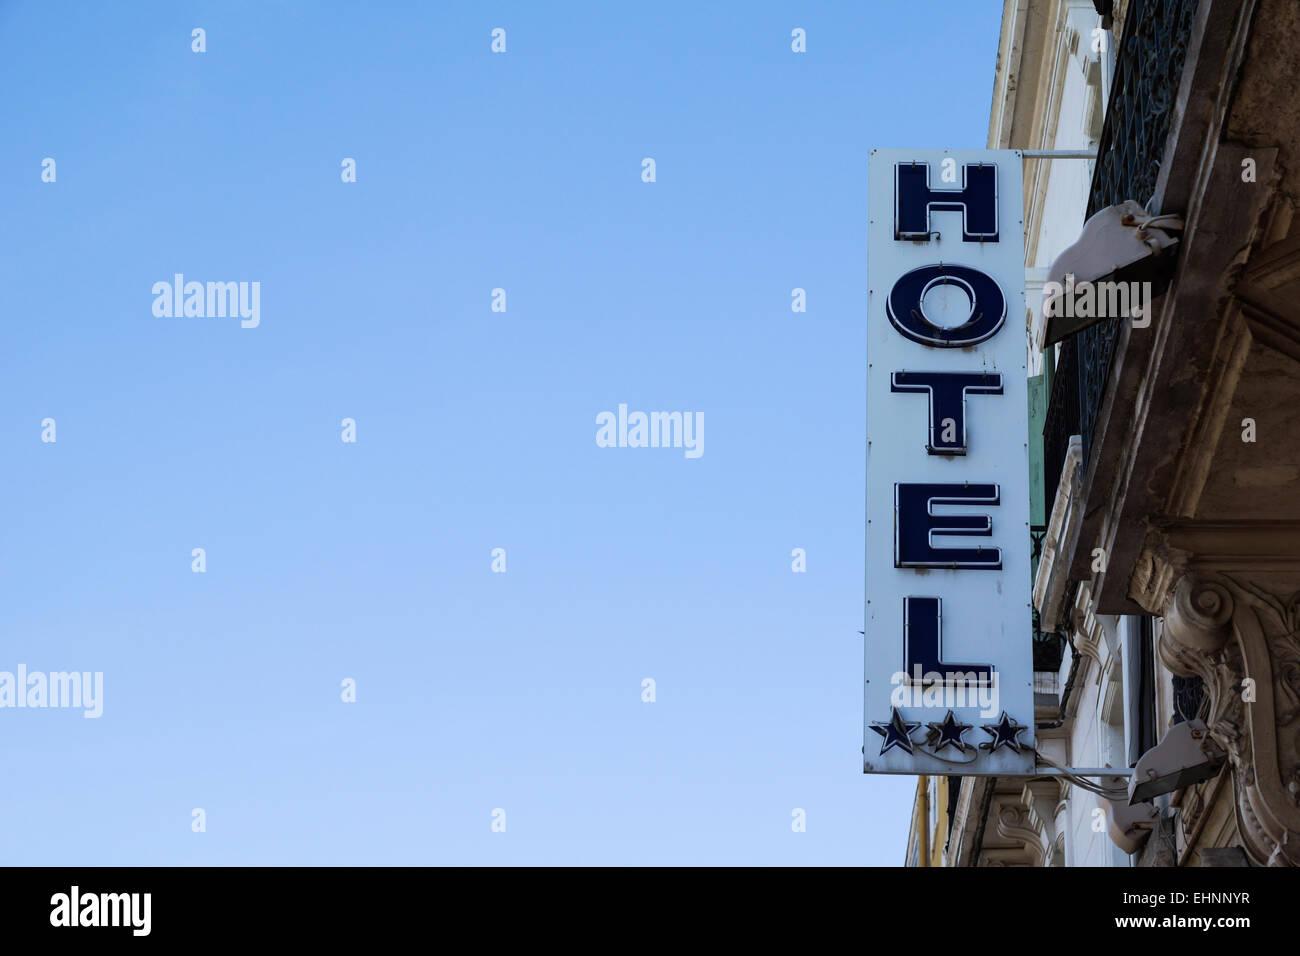 Drei Sterne Hotel Stock Photos Drei Sterne Hotel Stock Images